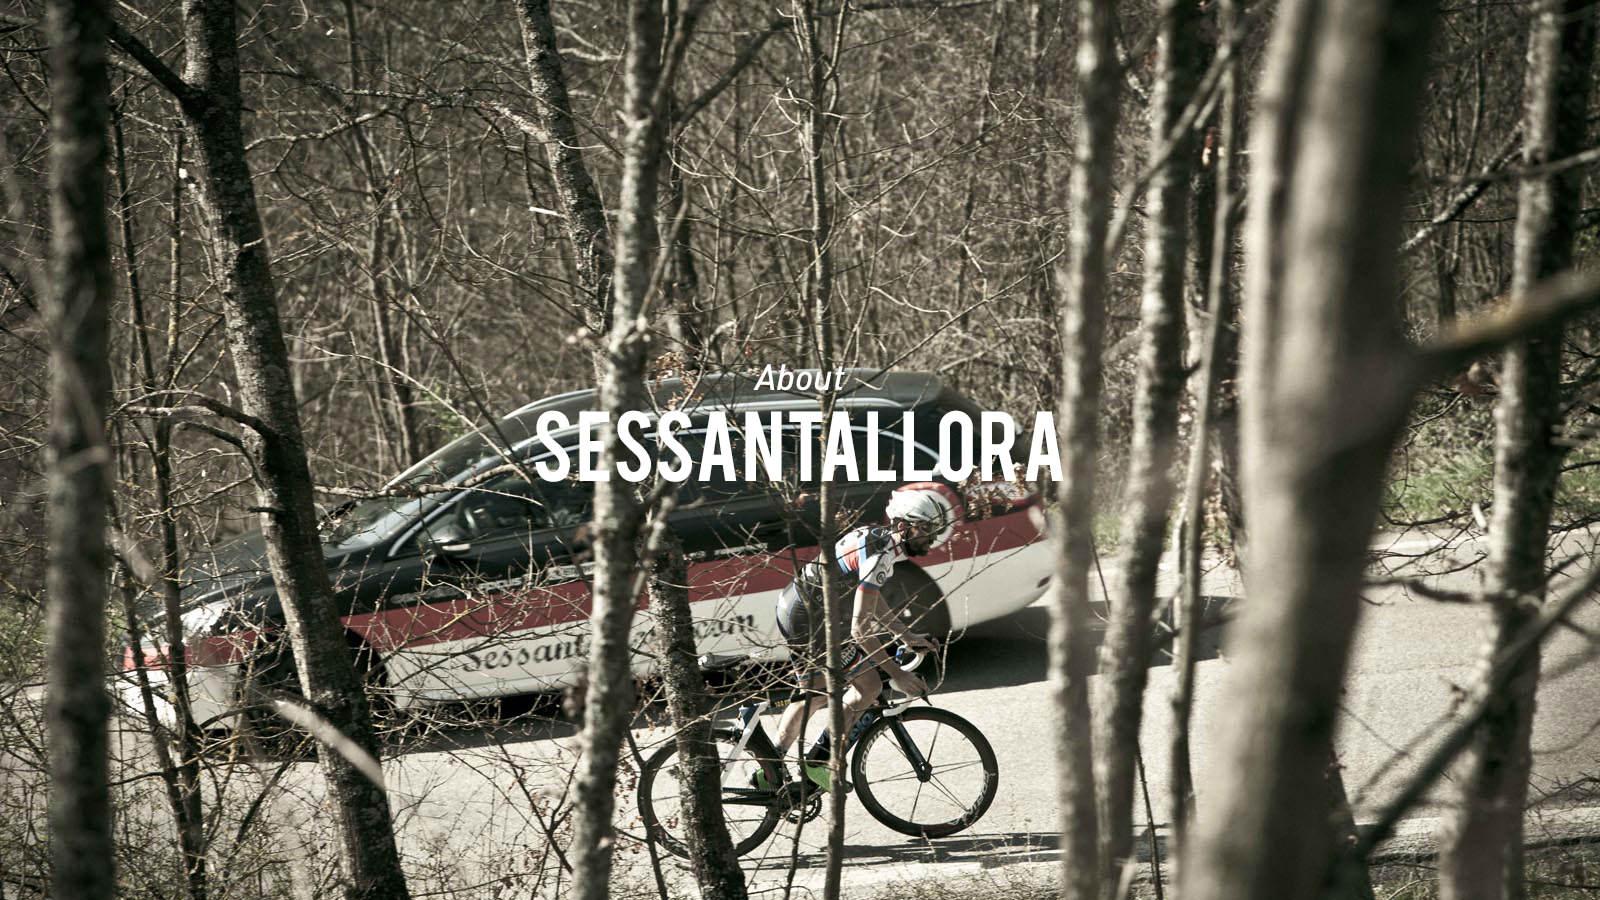 About Sessantallora